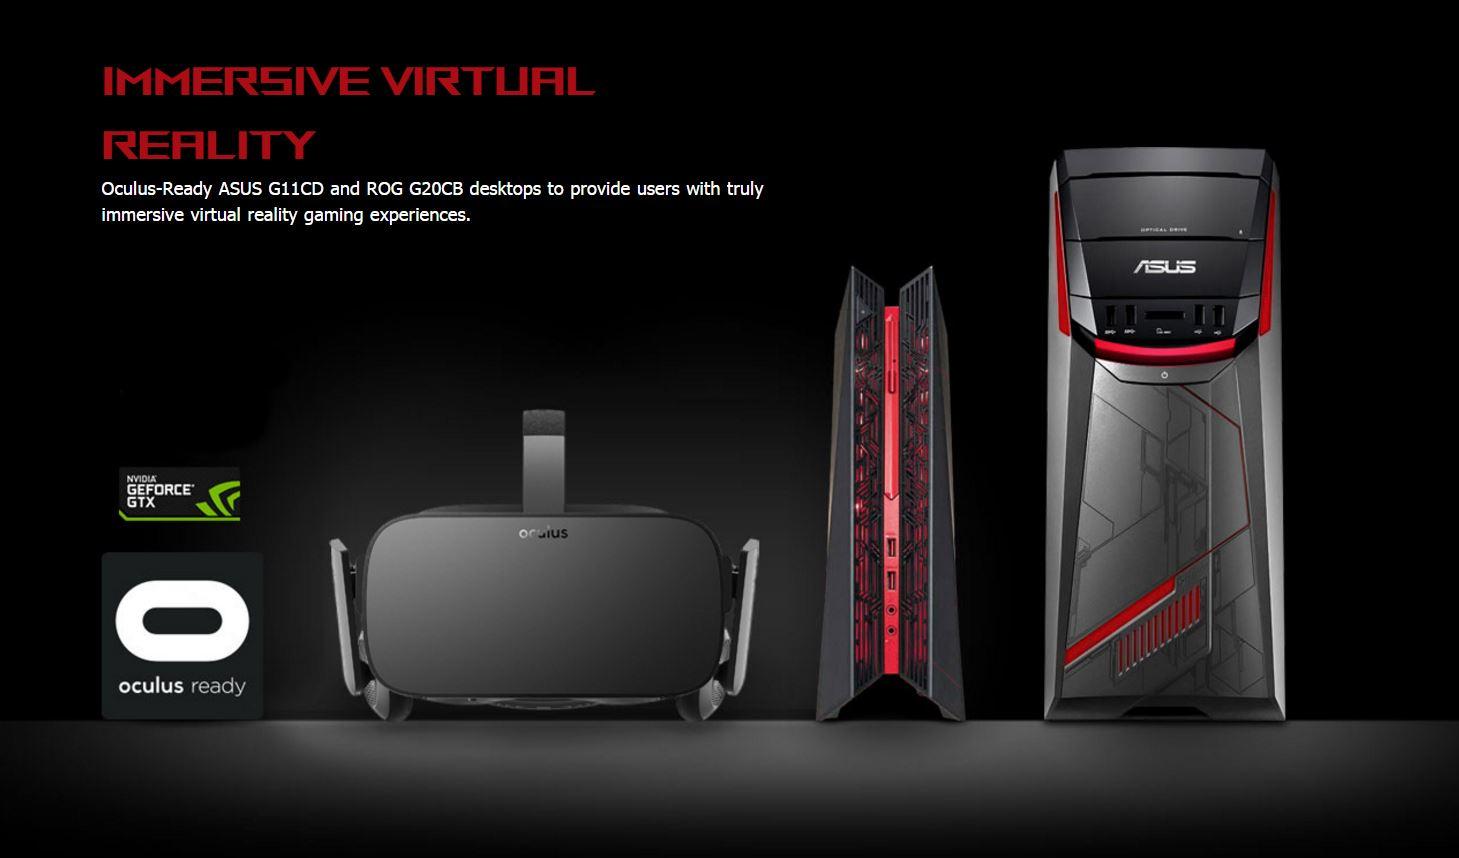 VR-Ready-G20-G11